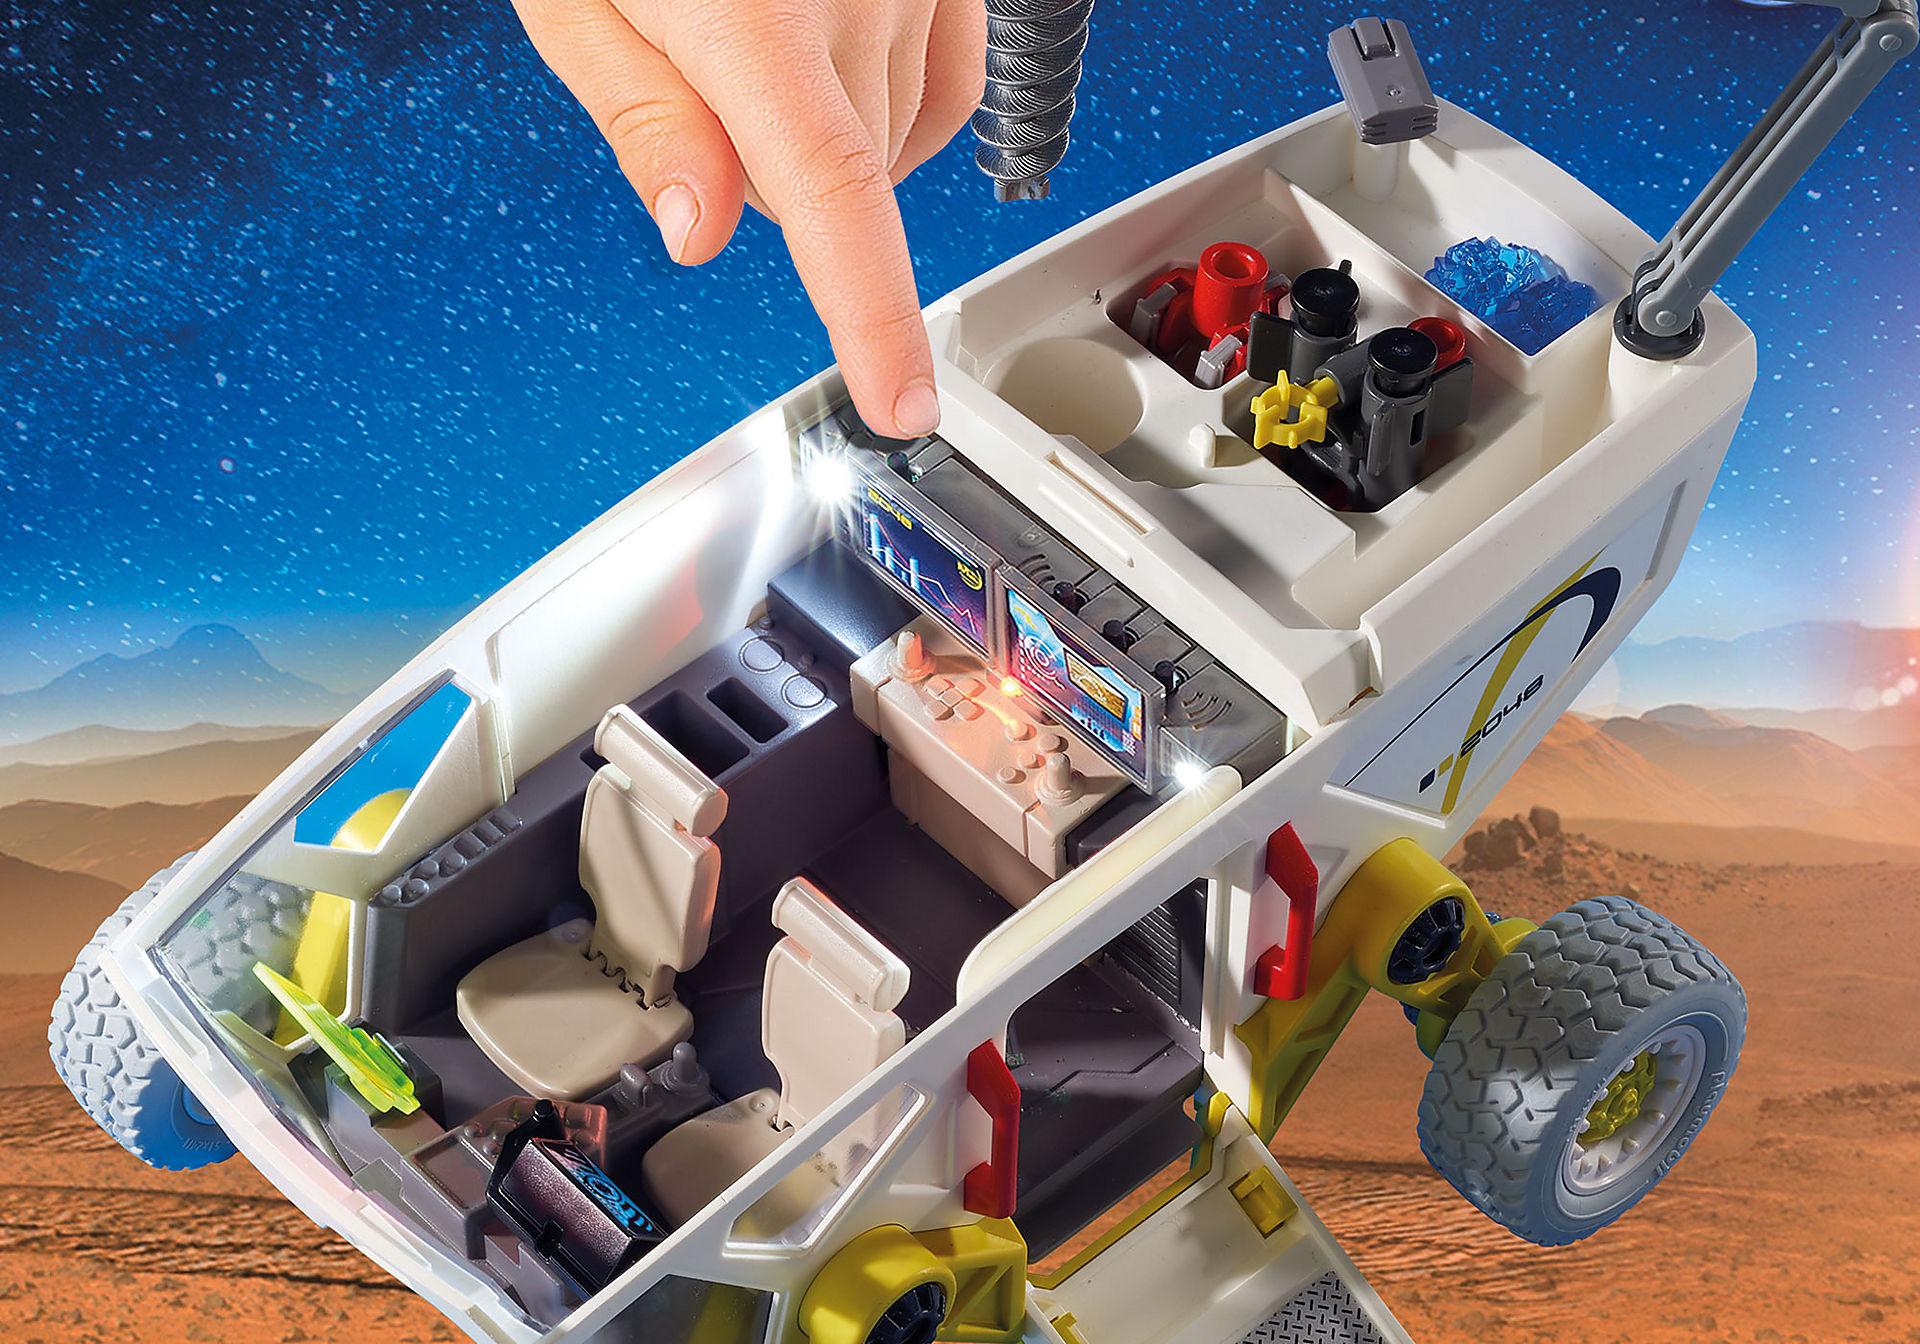 http://media.playmobil.com/i/playmobil/9489_product_extra2/Mars Research Vehicle